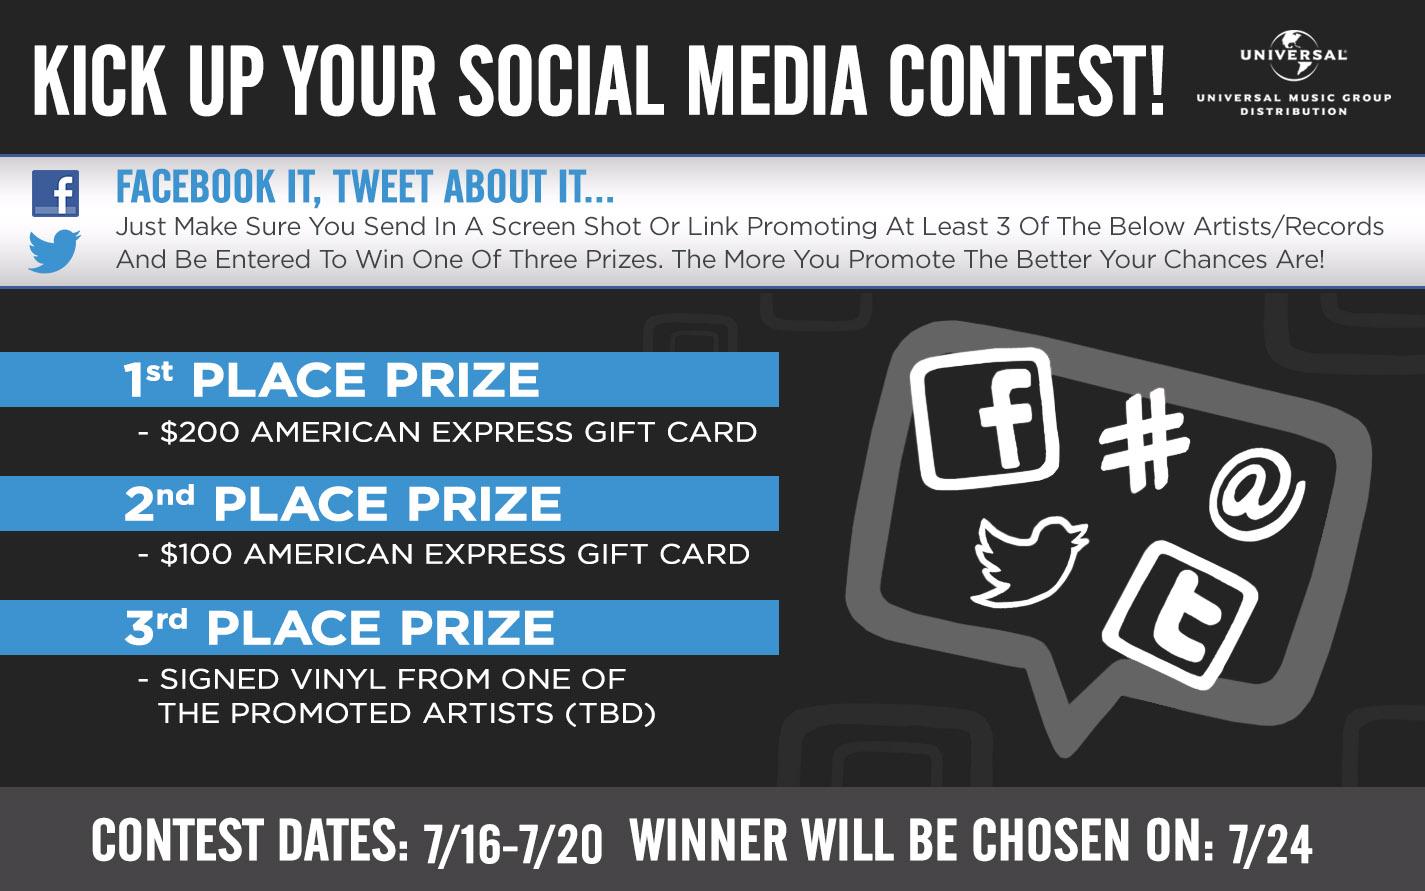 Social Media Contest Eblast Graphic